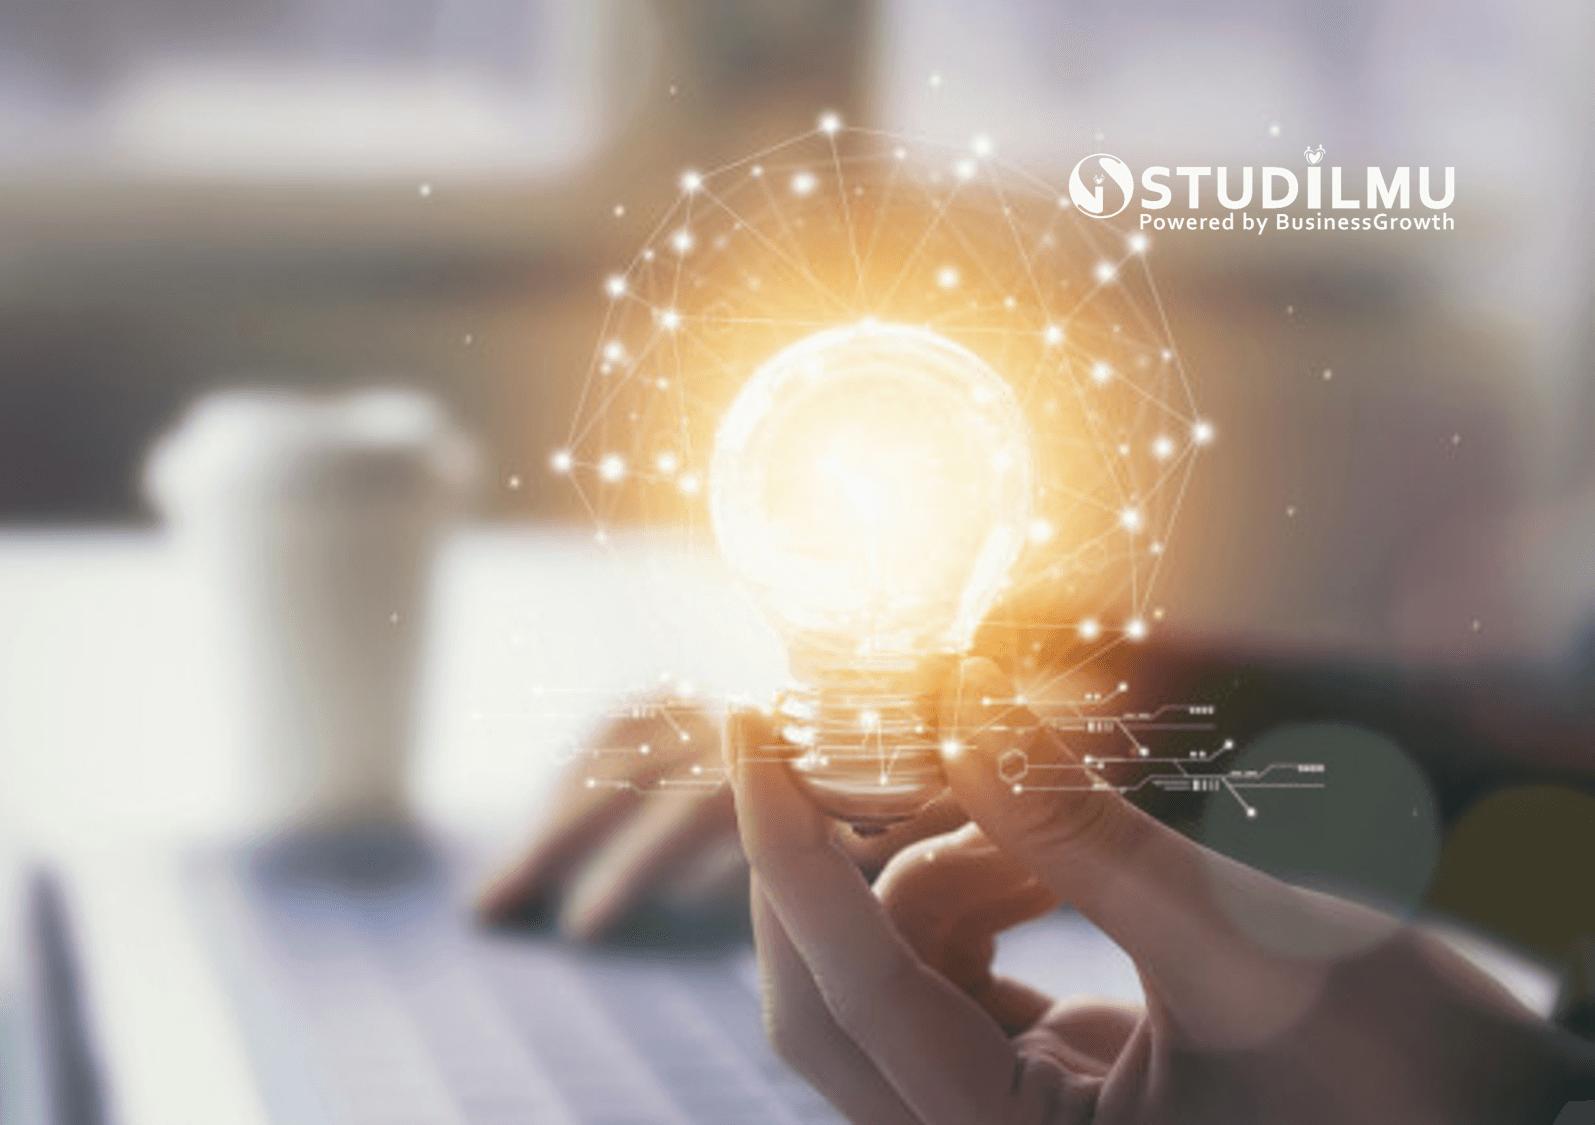 5 Pertanyaan Meningkatkan Semangat Inovasi